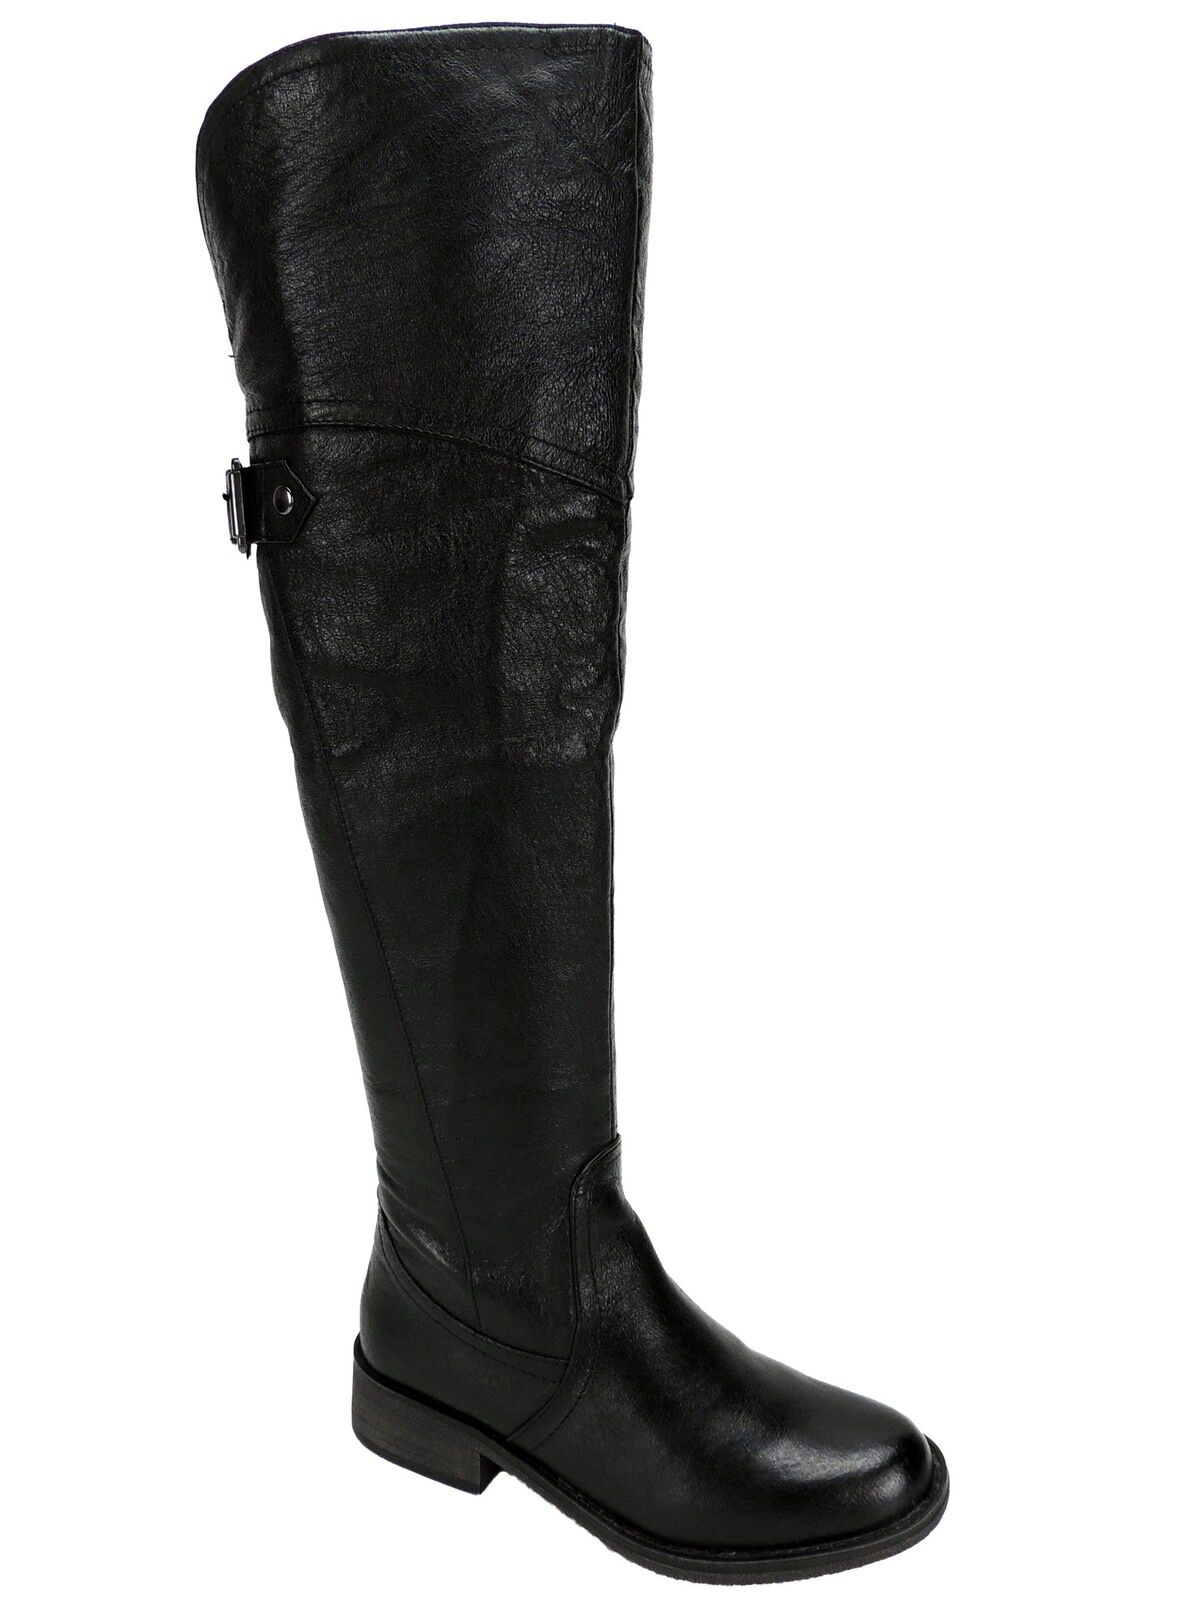 Steve Madden Women's Women's Women's OTK Boots Black Leather Over-The-Knee Boot Size 5 1 2 M 531f14